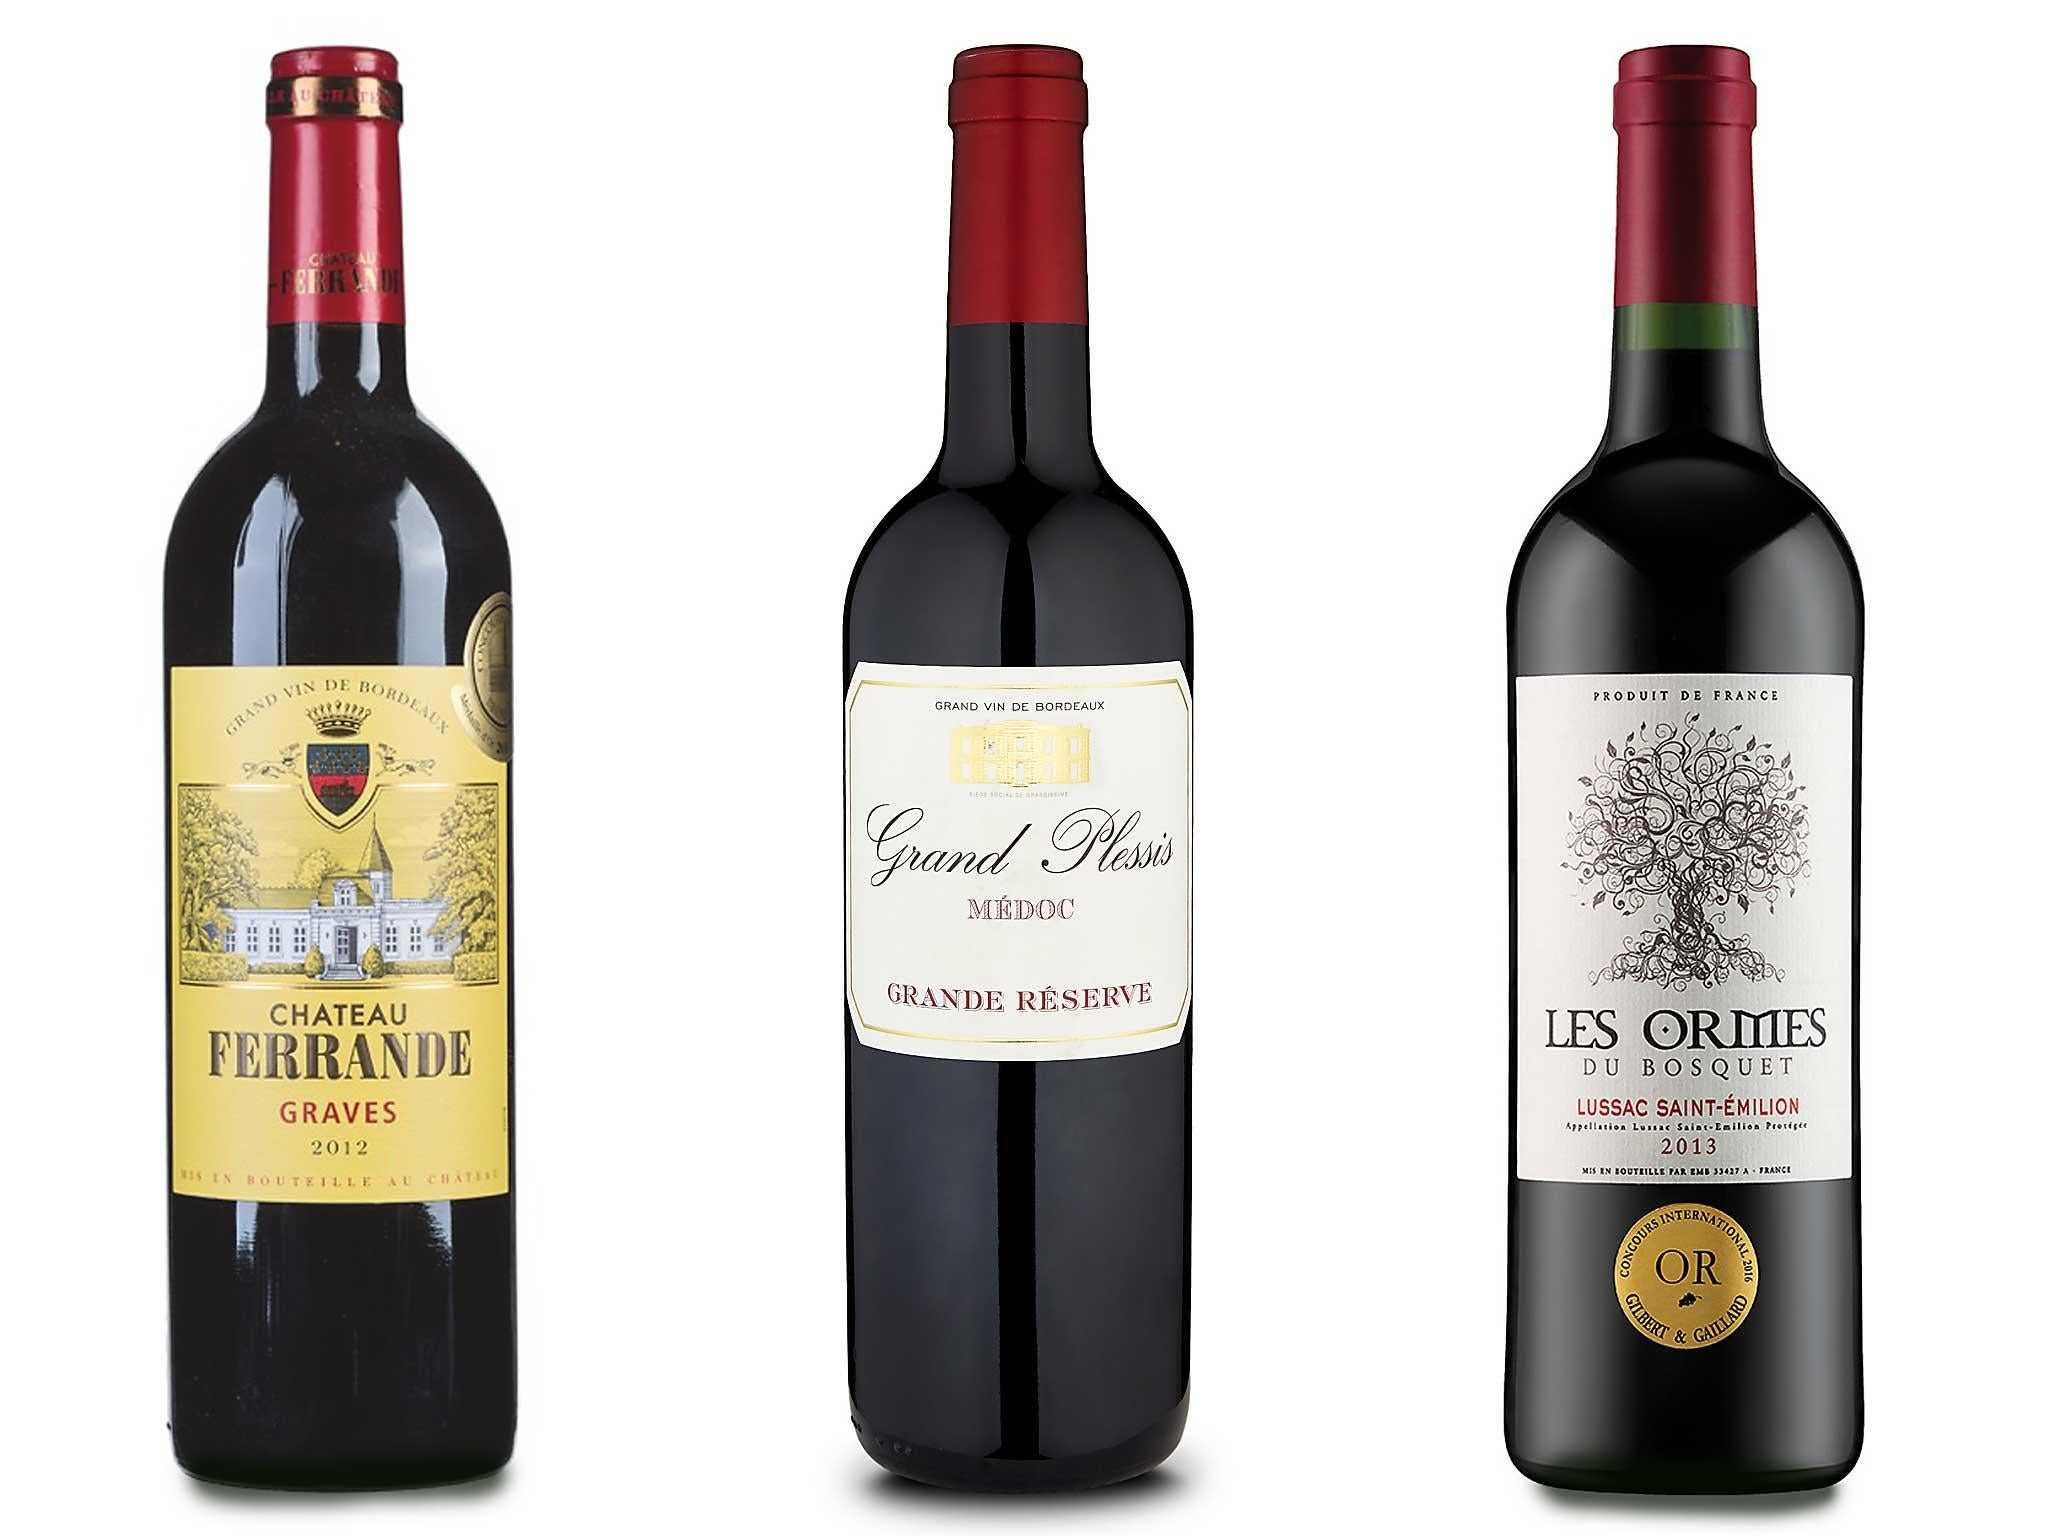 Blue apron wine review - Blue Apron Wine Review 29